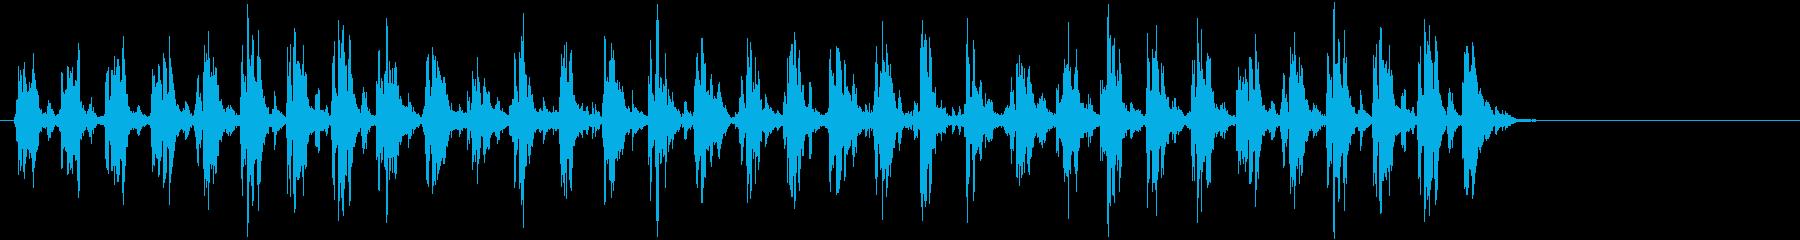 Xmasに最適トナカイベルのループ音05の再生済みの波形